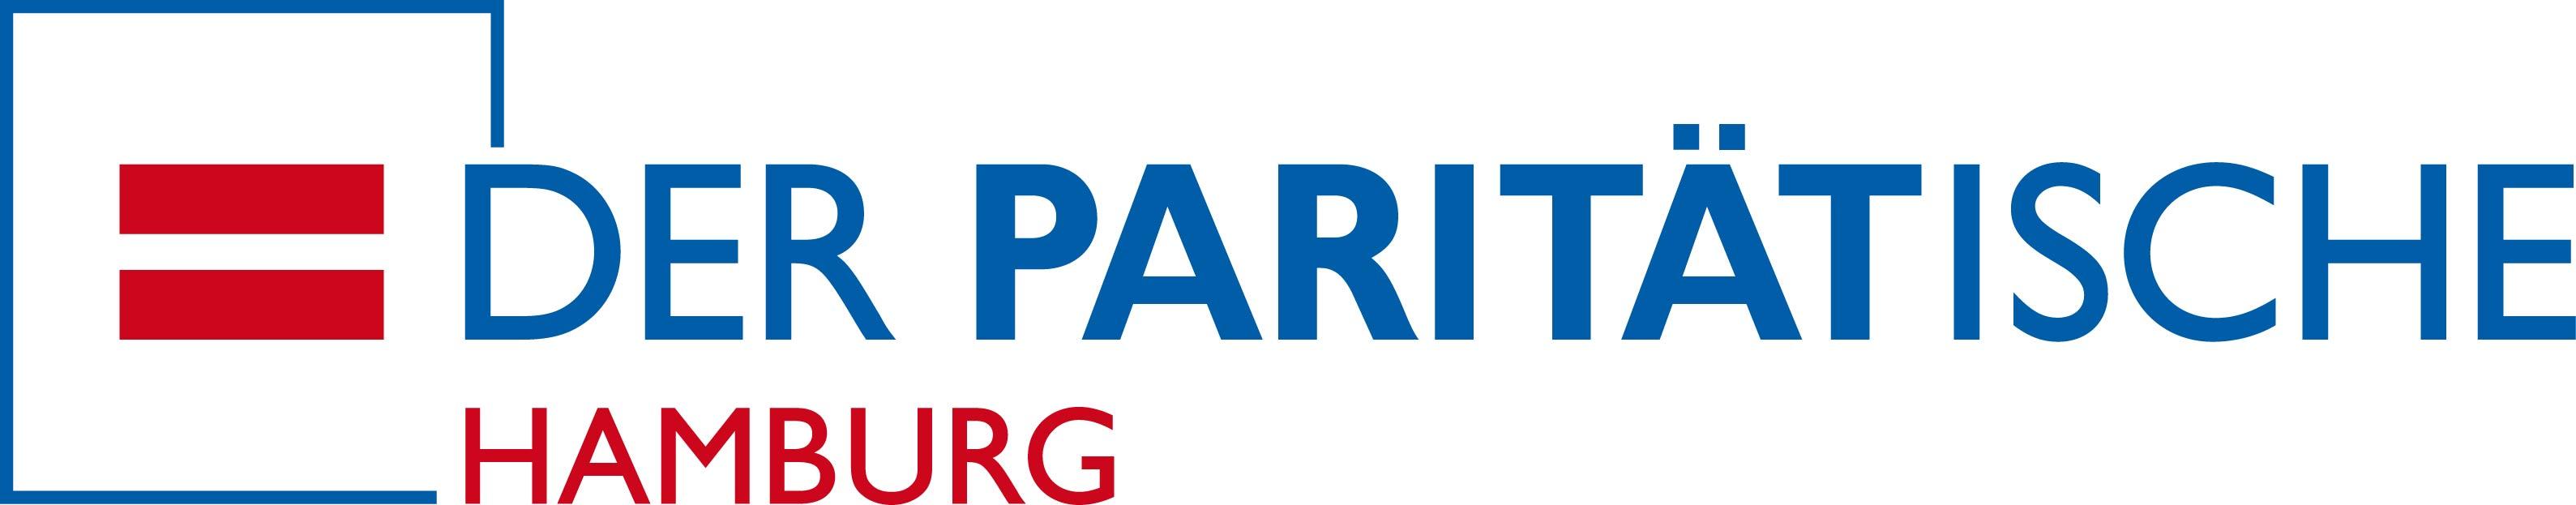 Parität Logo_Hamburg FINAL